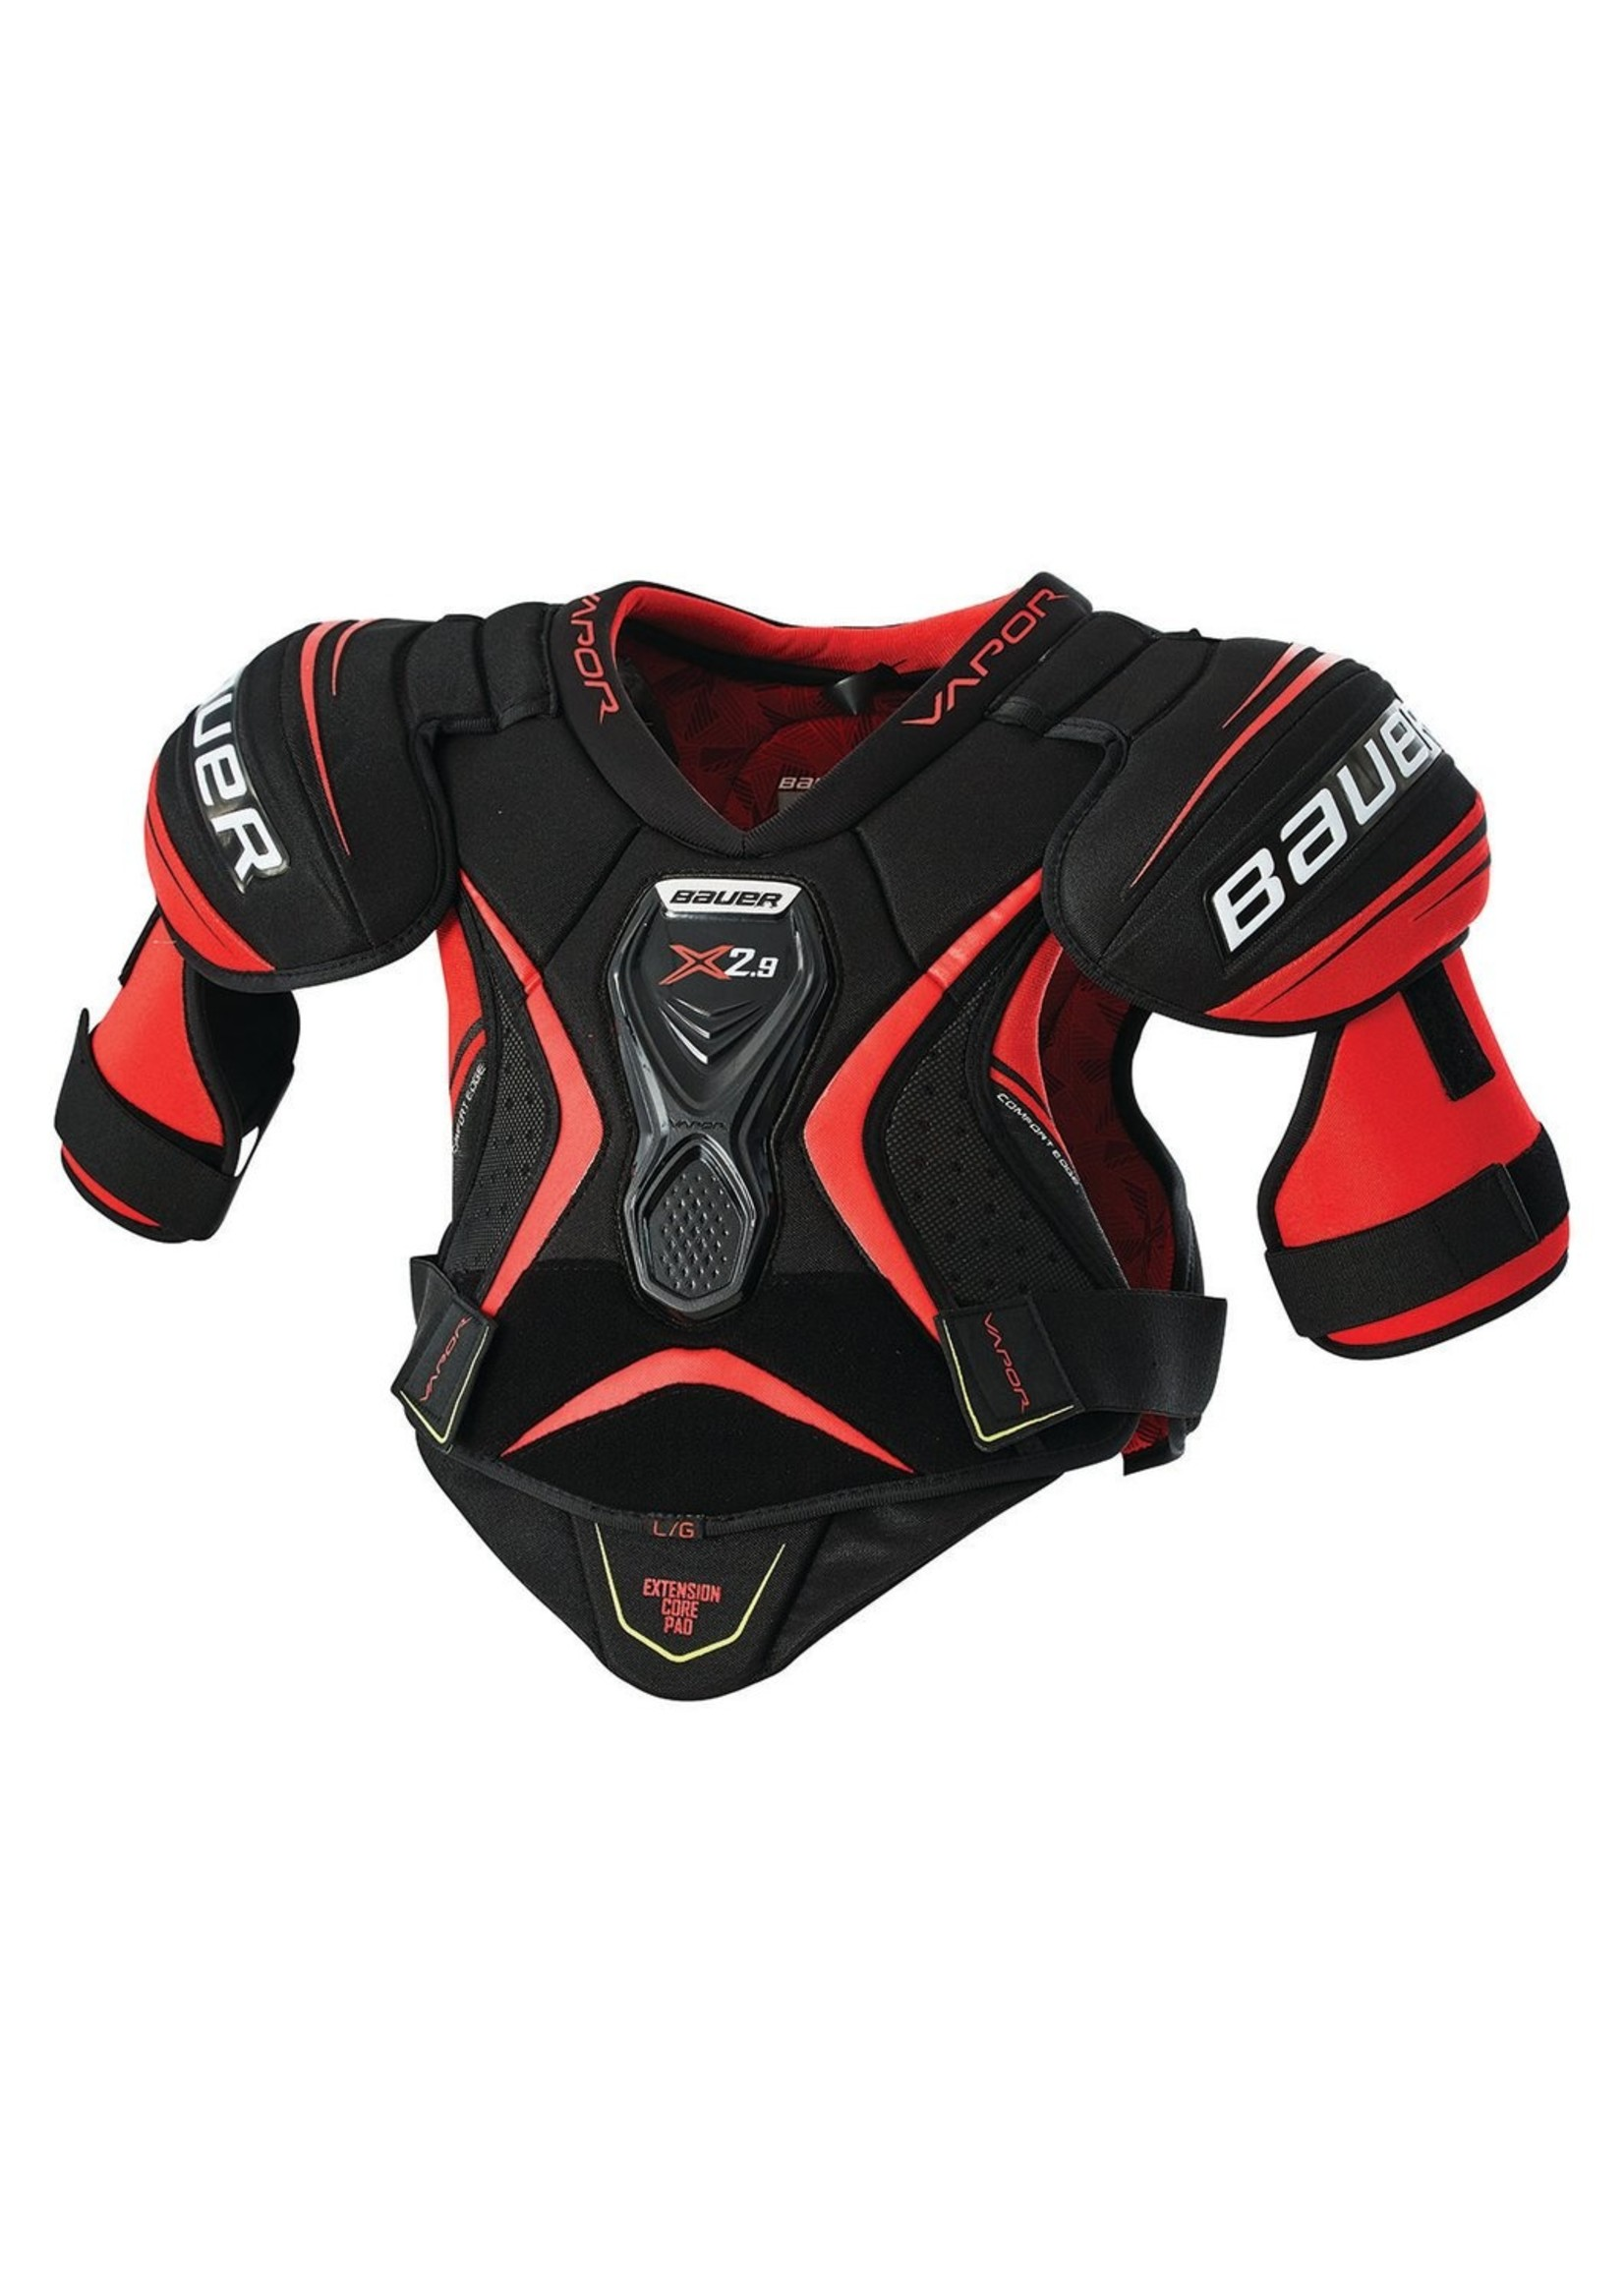 Bauer Hockey BAUER S20 VAPOR X2.9 SR SHOULDER PADS